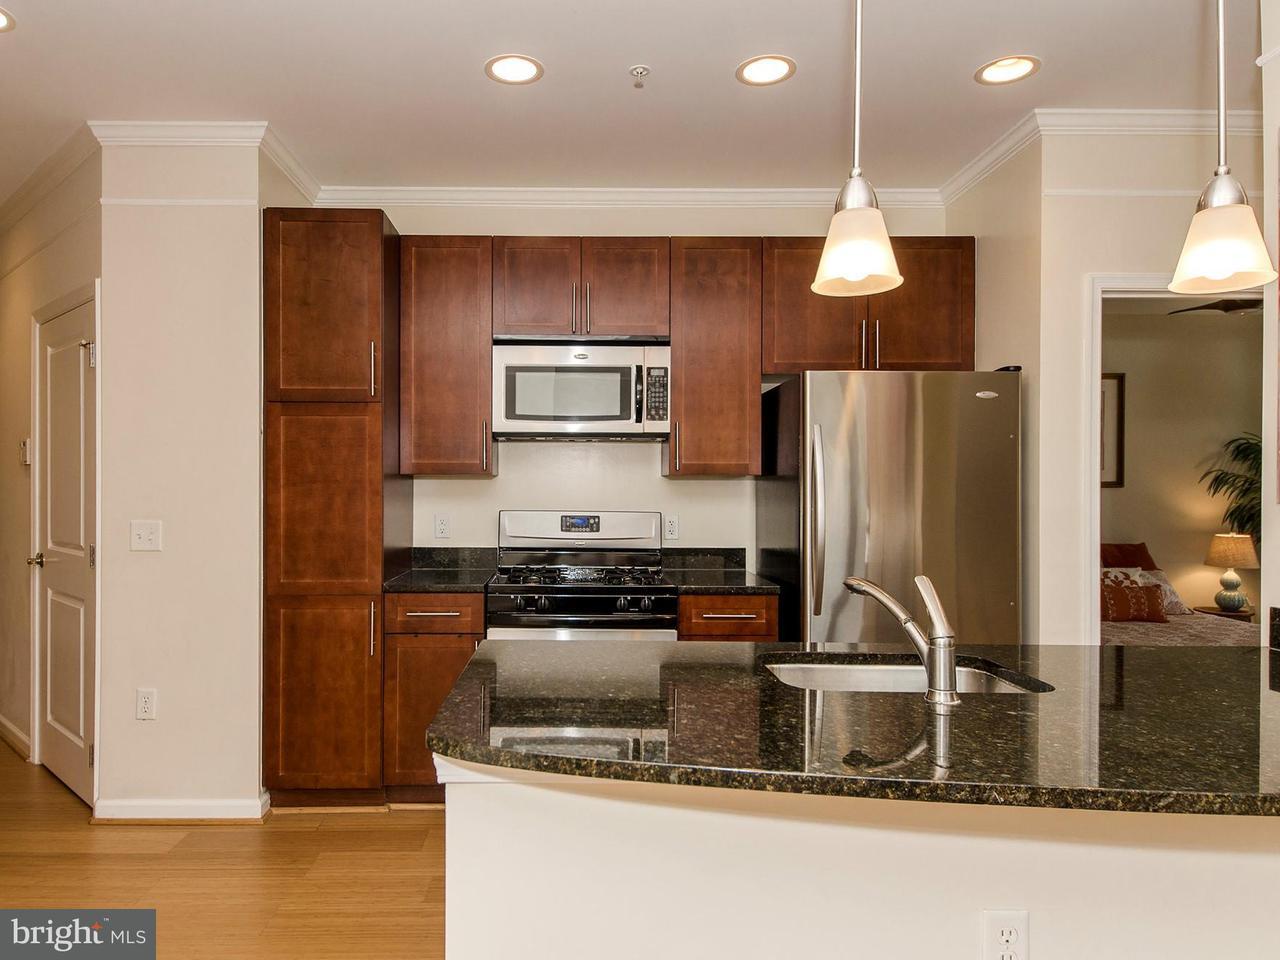 Additional photo for property listing at 444 Broad St W #308 444 Broad St W #308 Falls Church, 弗吉尼亞州 22046 美國